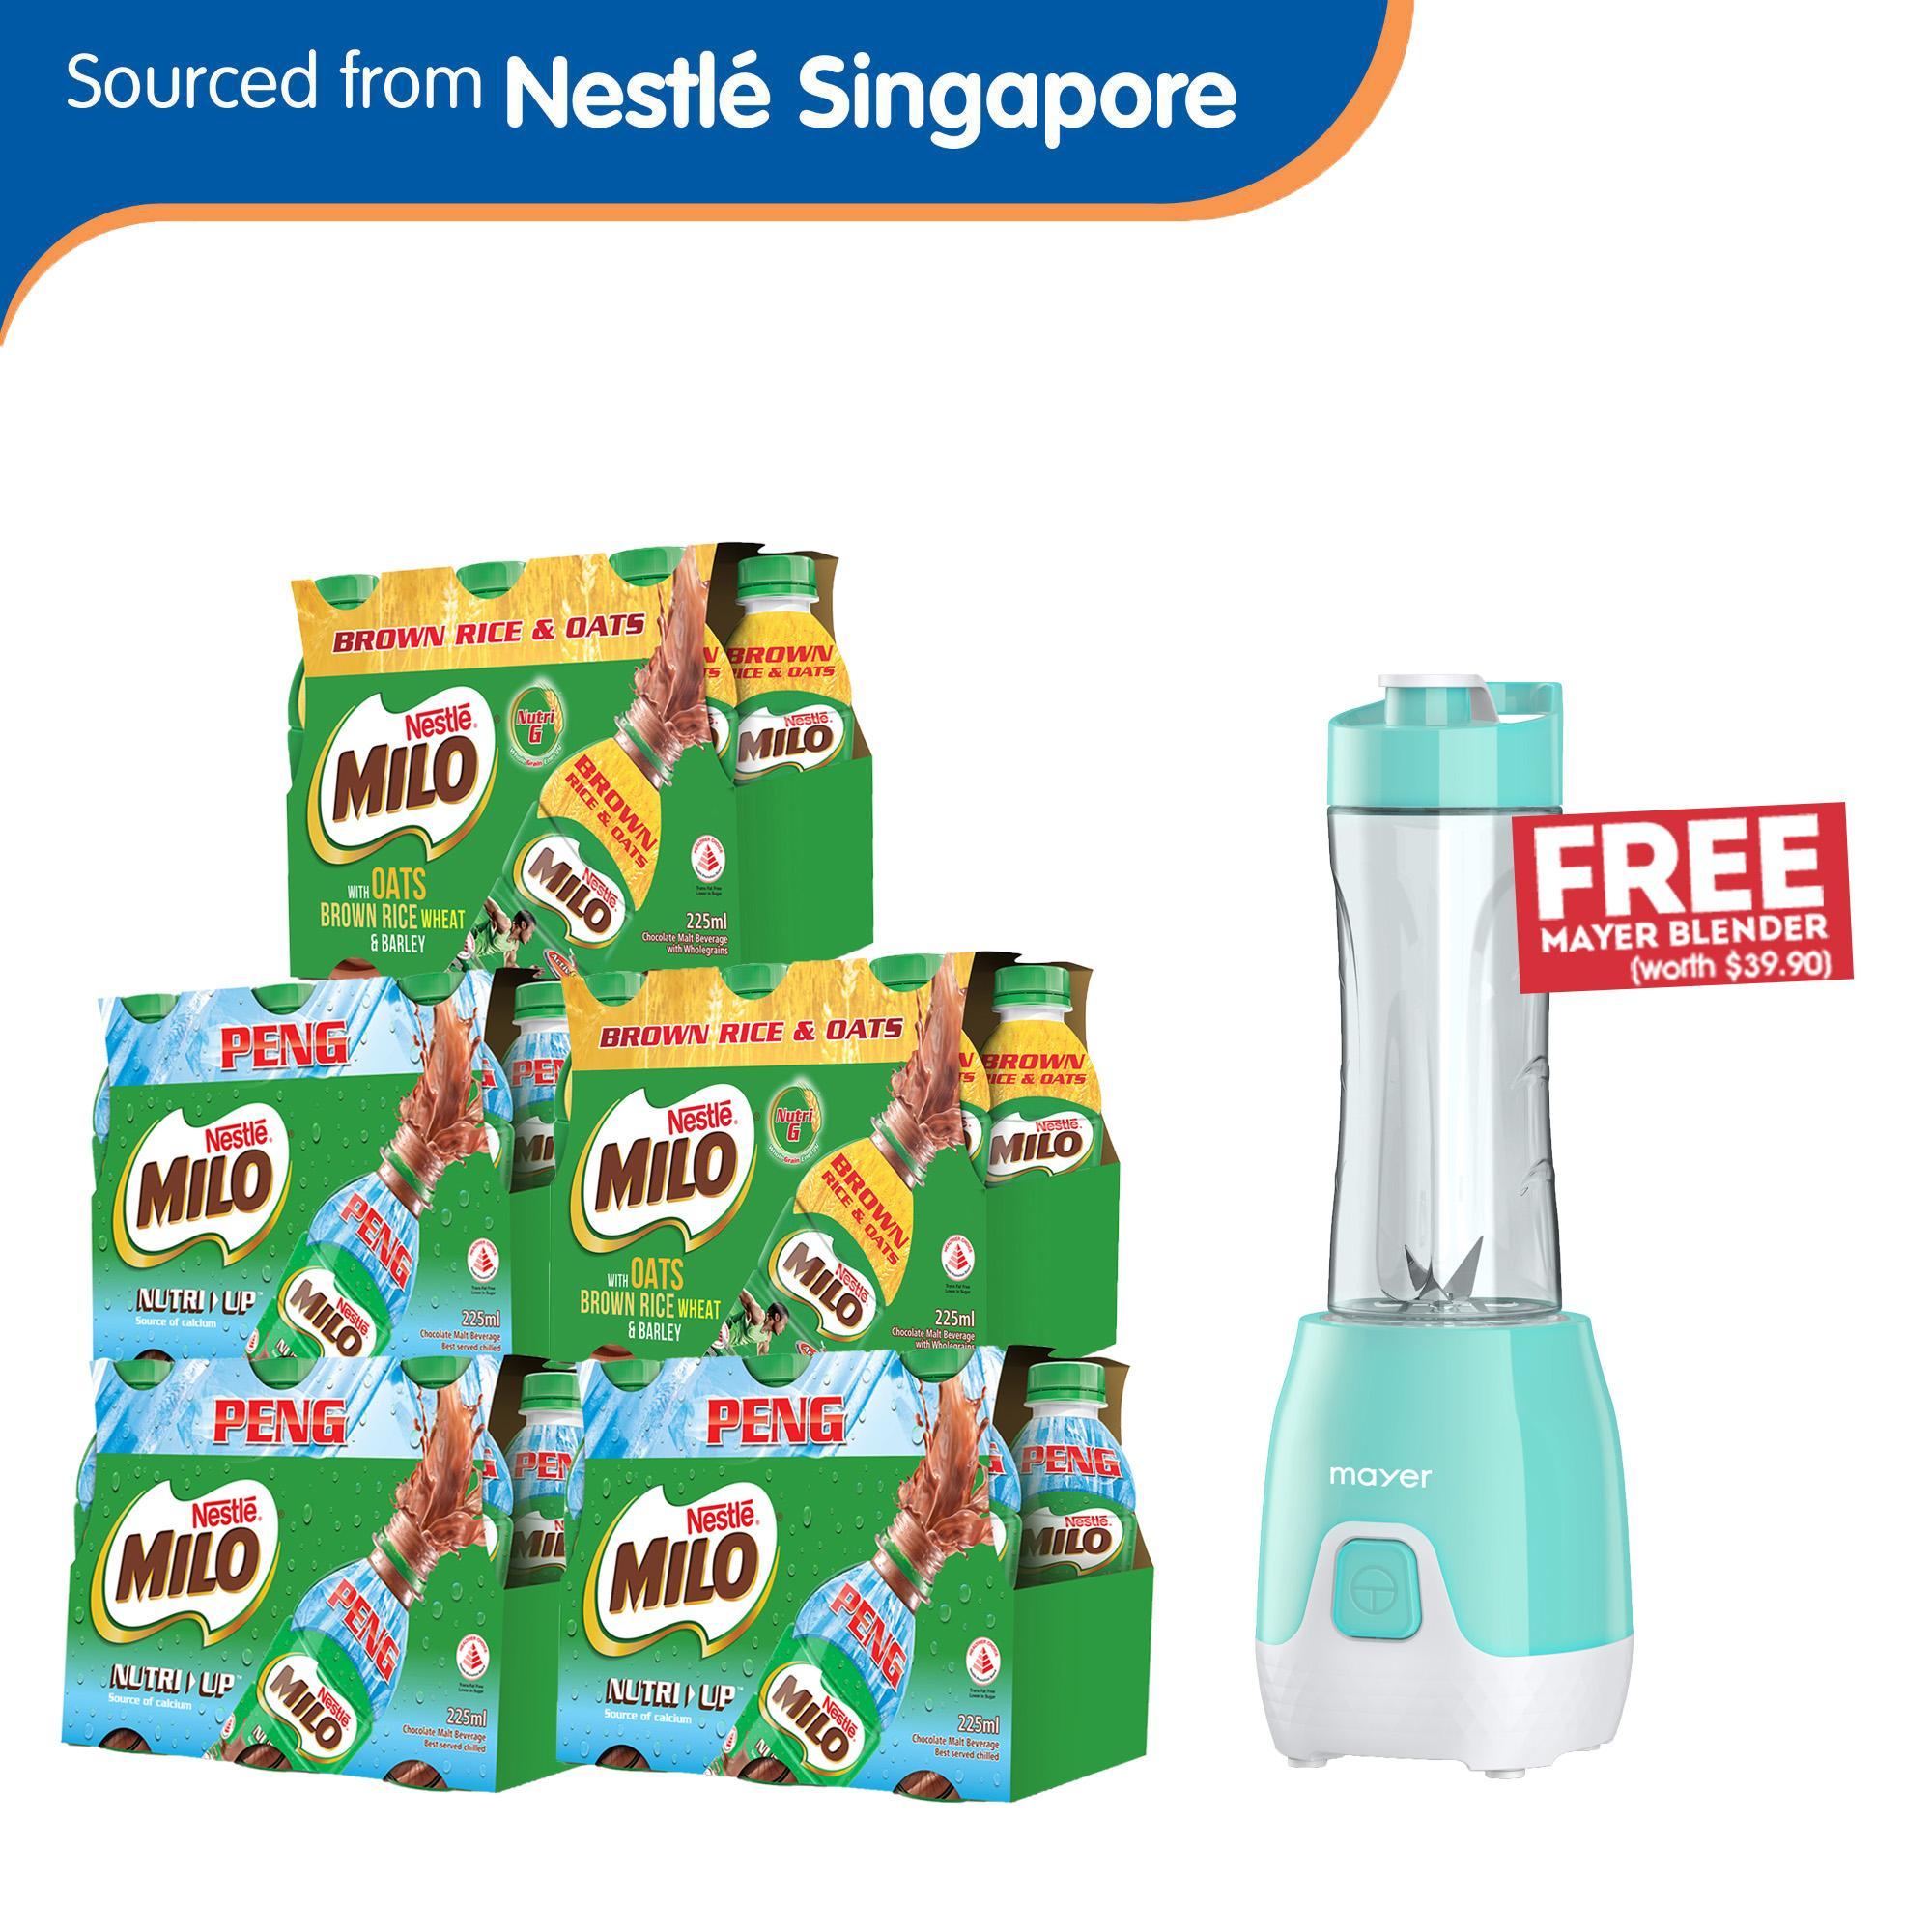 5-clusters30-bottles-milo-nutri-g-peng-free-mayer-blender-worth-3990